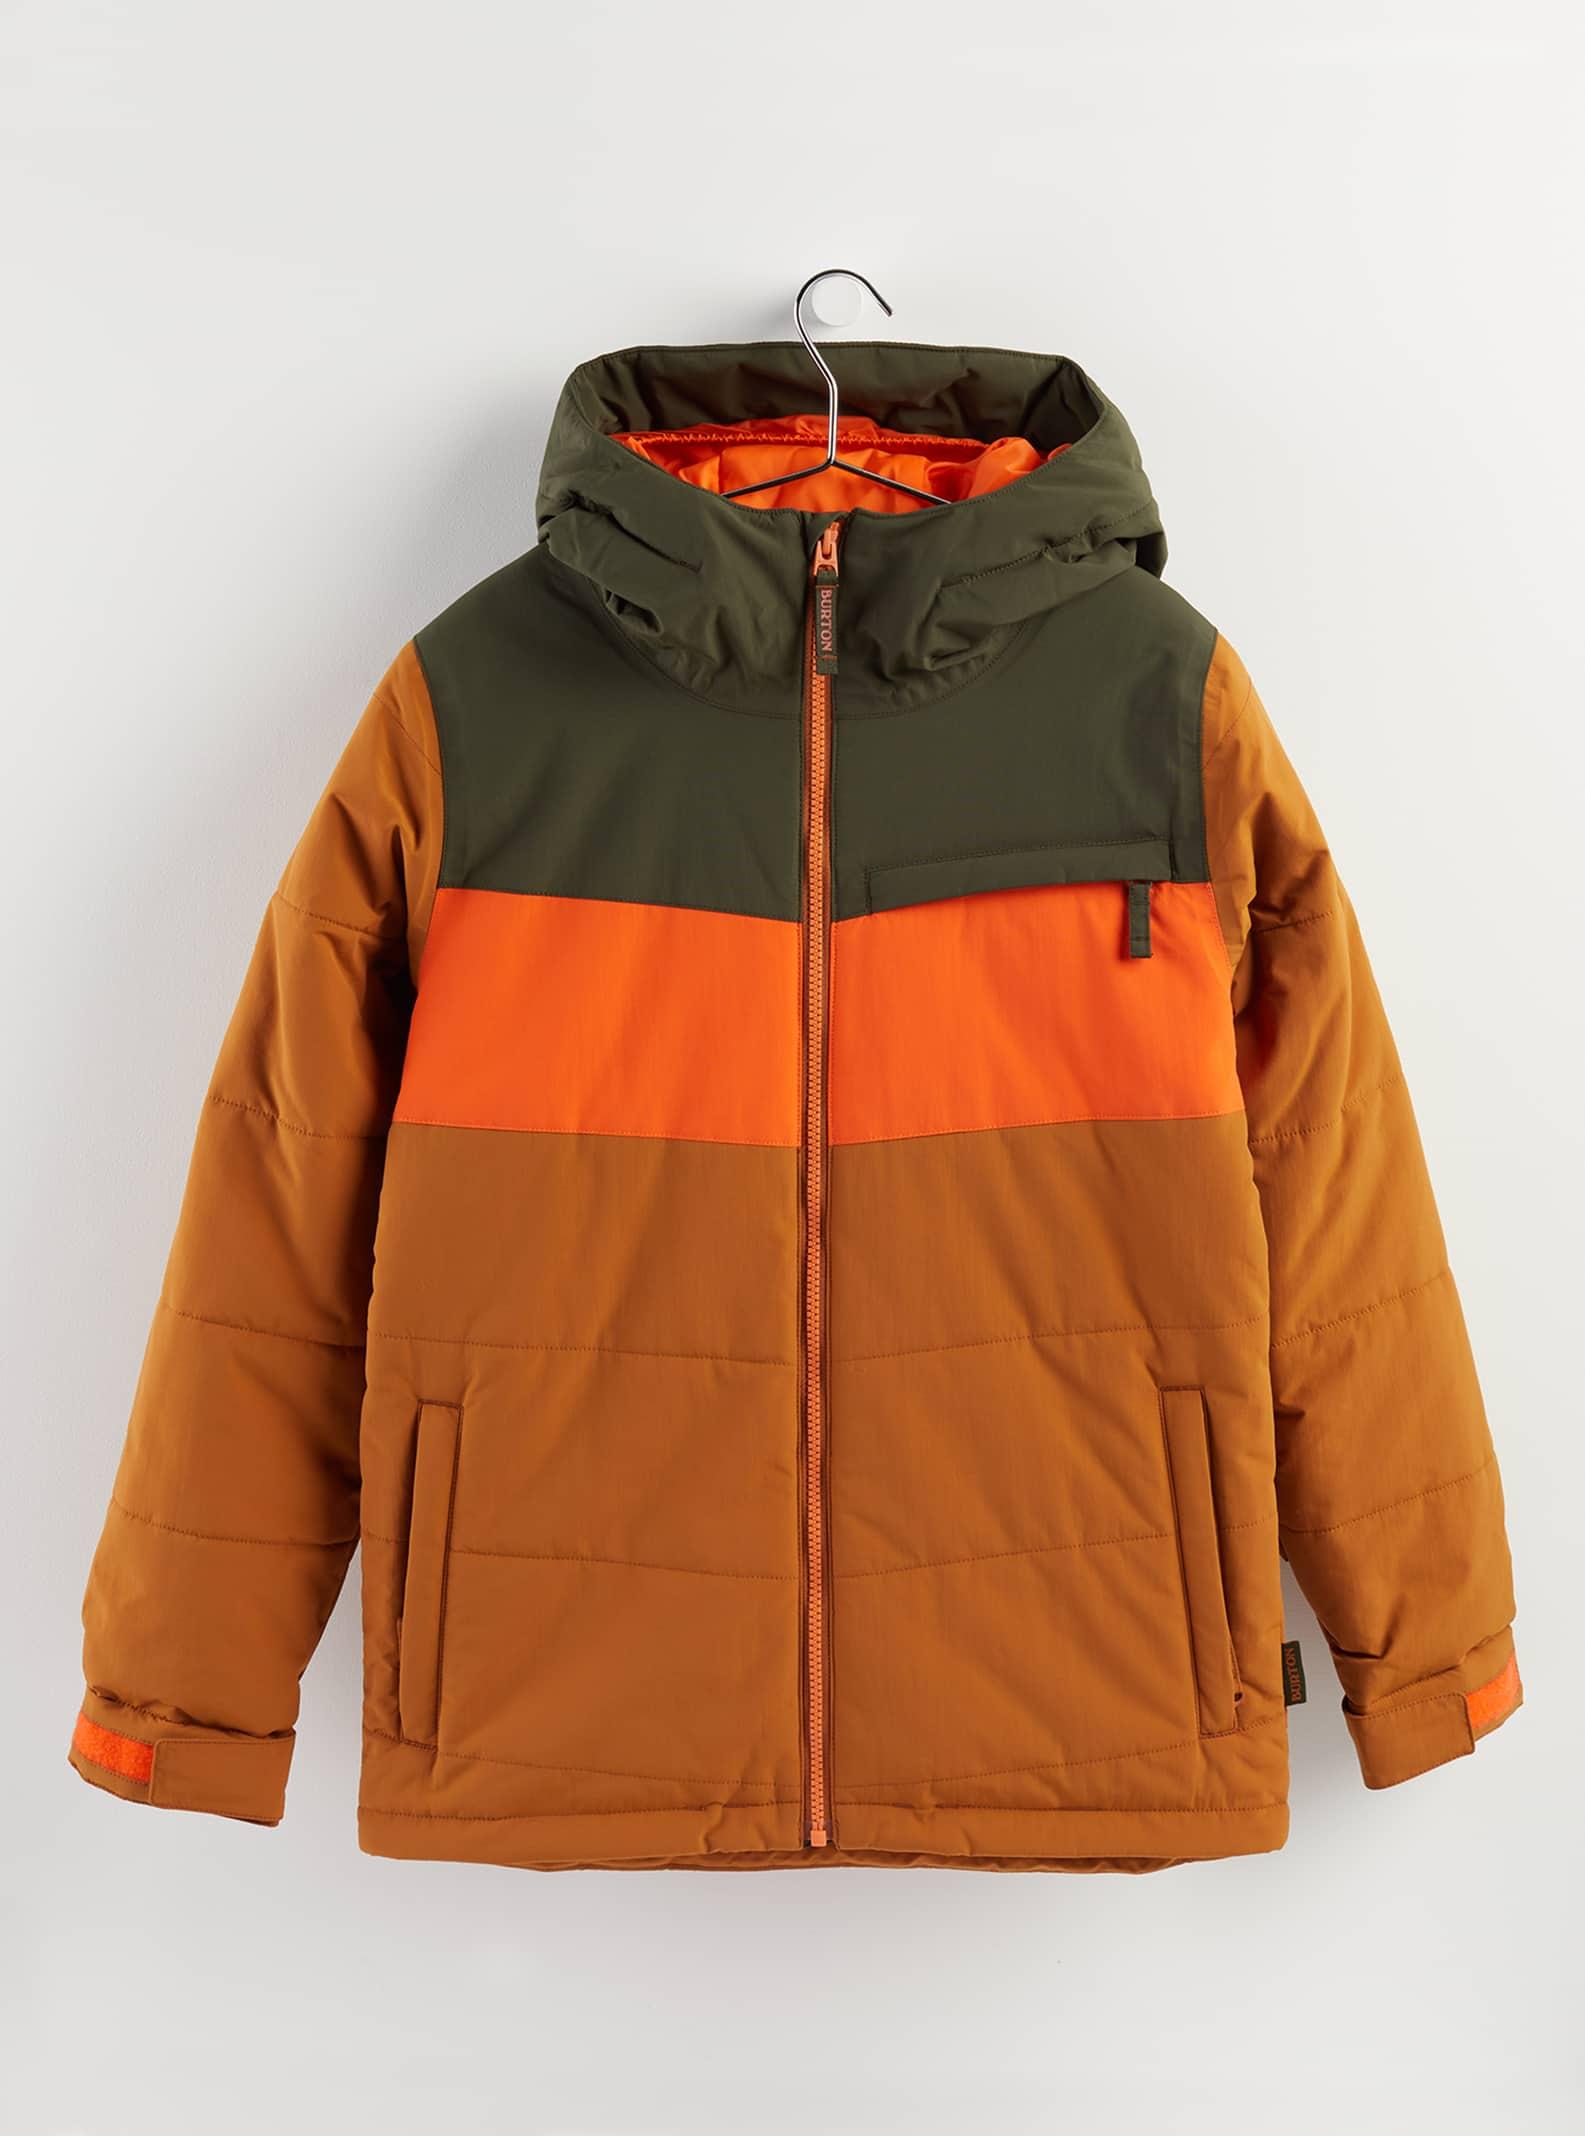 Burton Ropedrop jacka, pojkmodell, XS